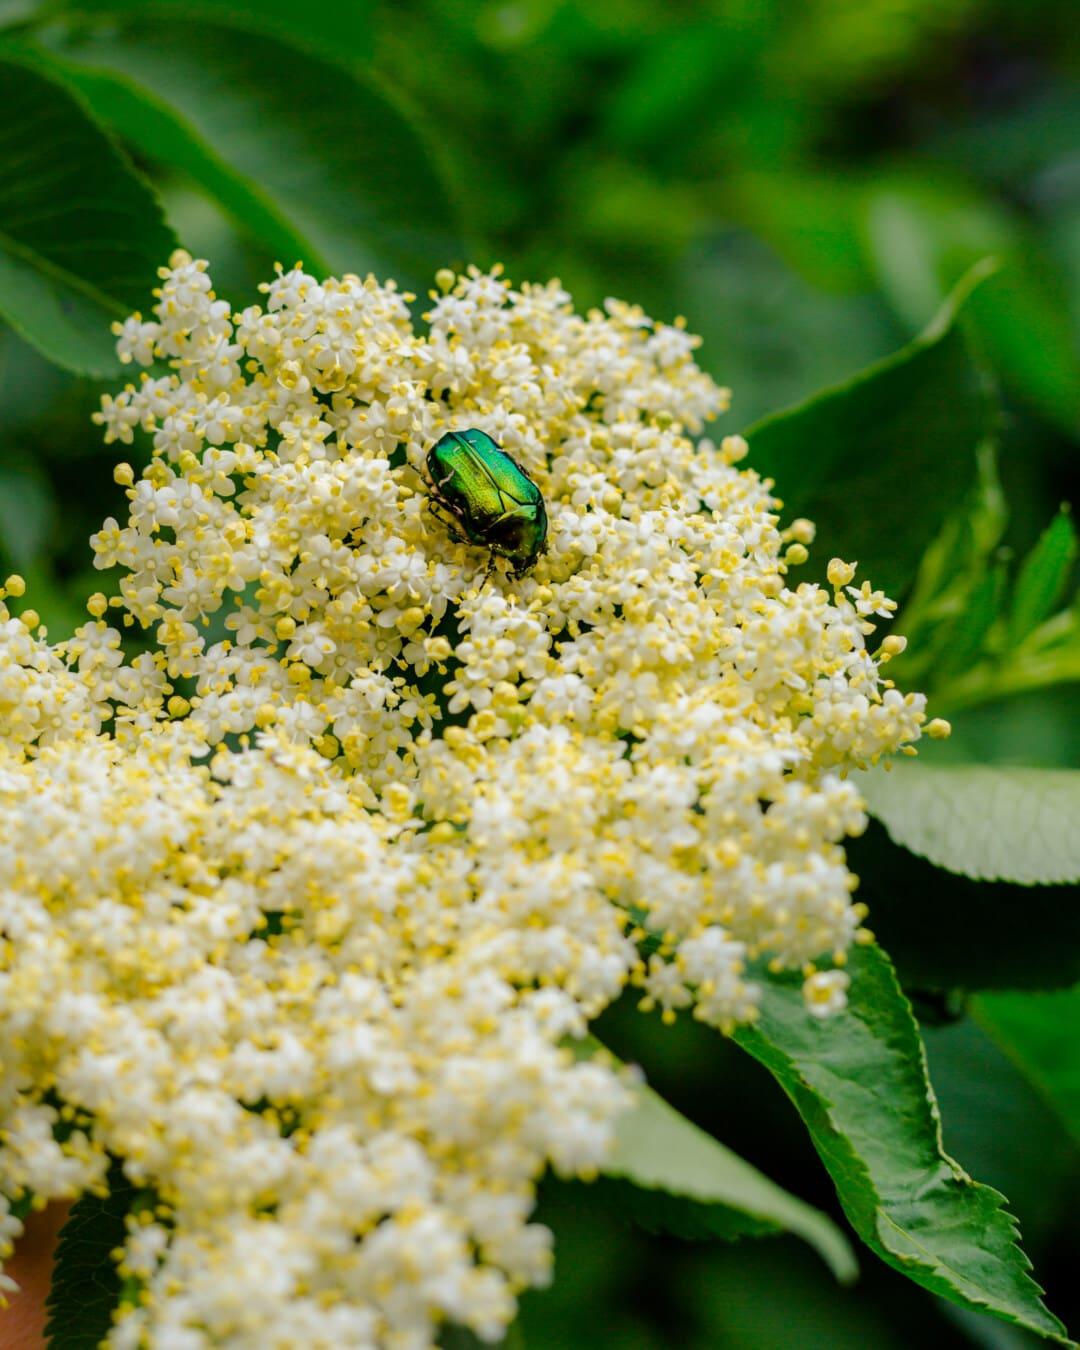 groen, schijnend, kever, insect, kever, witte bloem, bestuiving, natuur, bloem, struik